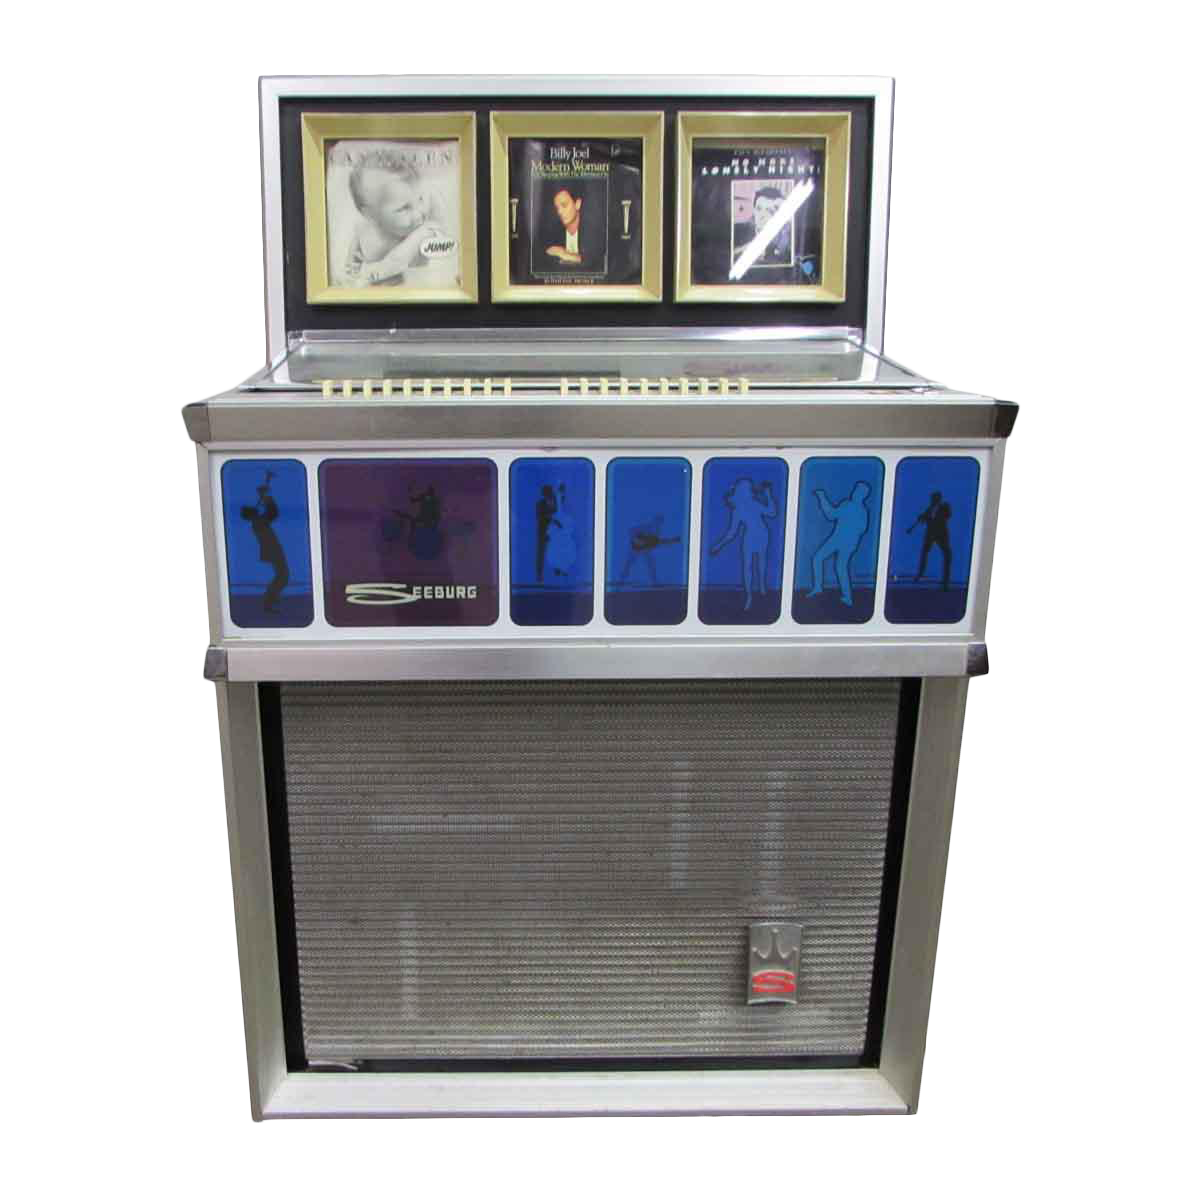 1967 seeburg jukebox model s100 chairish. Black Bedroom Furniture Sets. Home Design Ideas